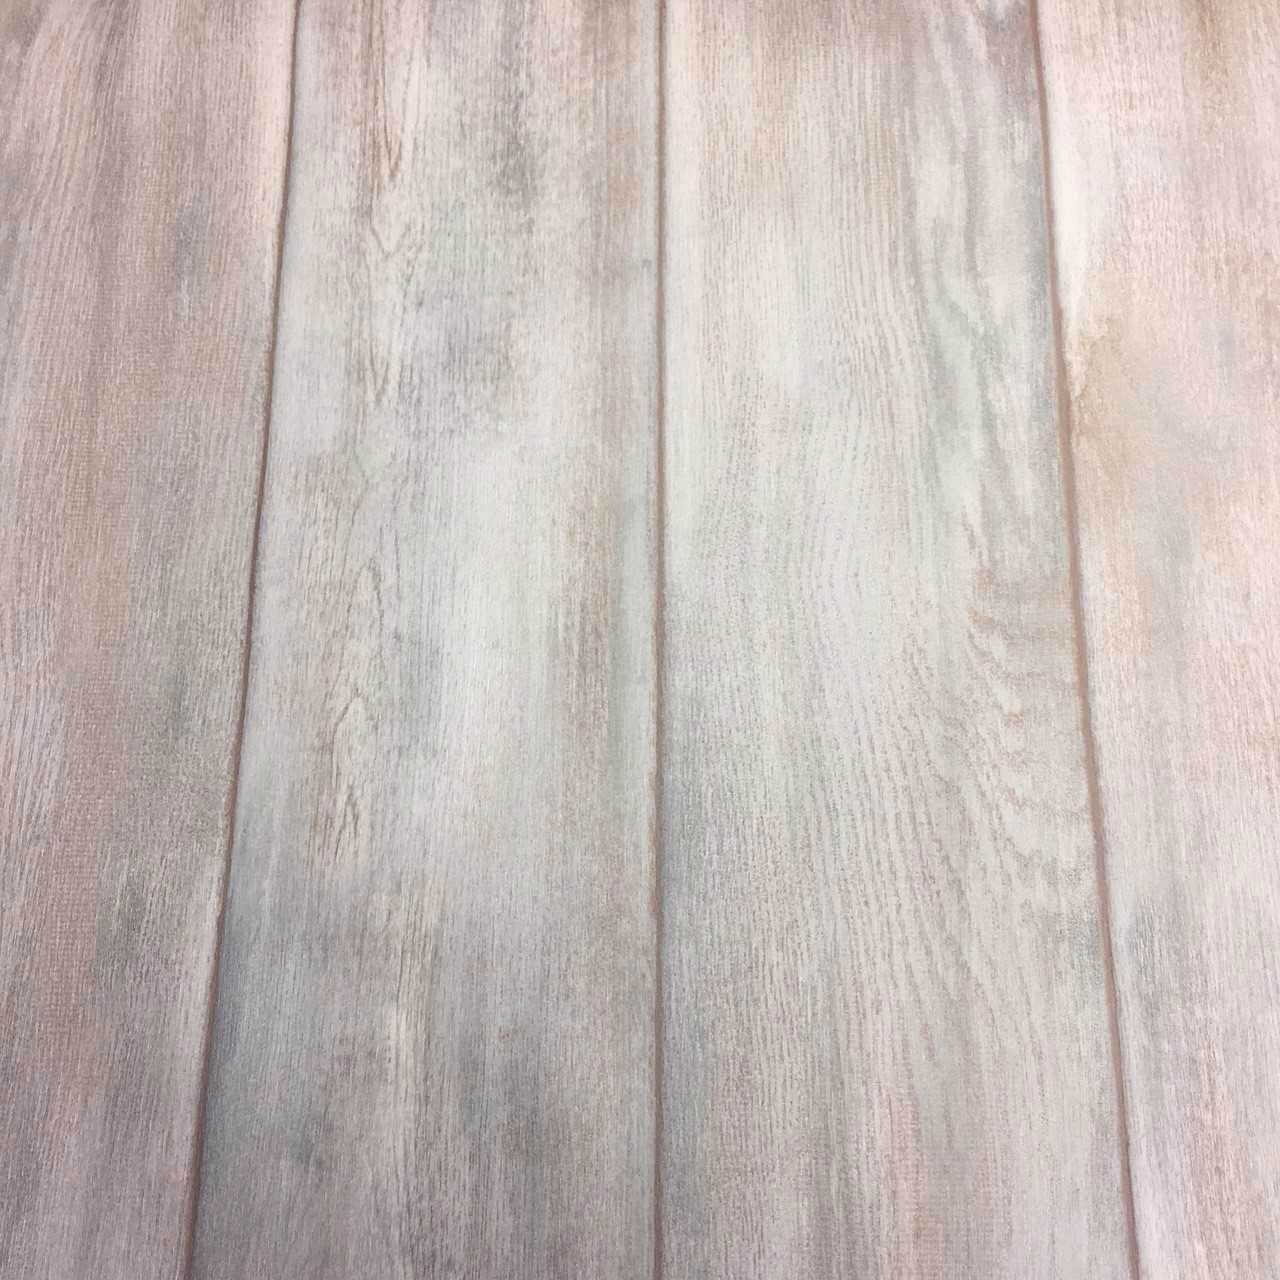 Wood-Effect-Wallpaper-Grains-Boards-Planks-Paste-The-Wall-Vinyl-Koziel-3-Colours thumbnail 10